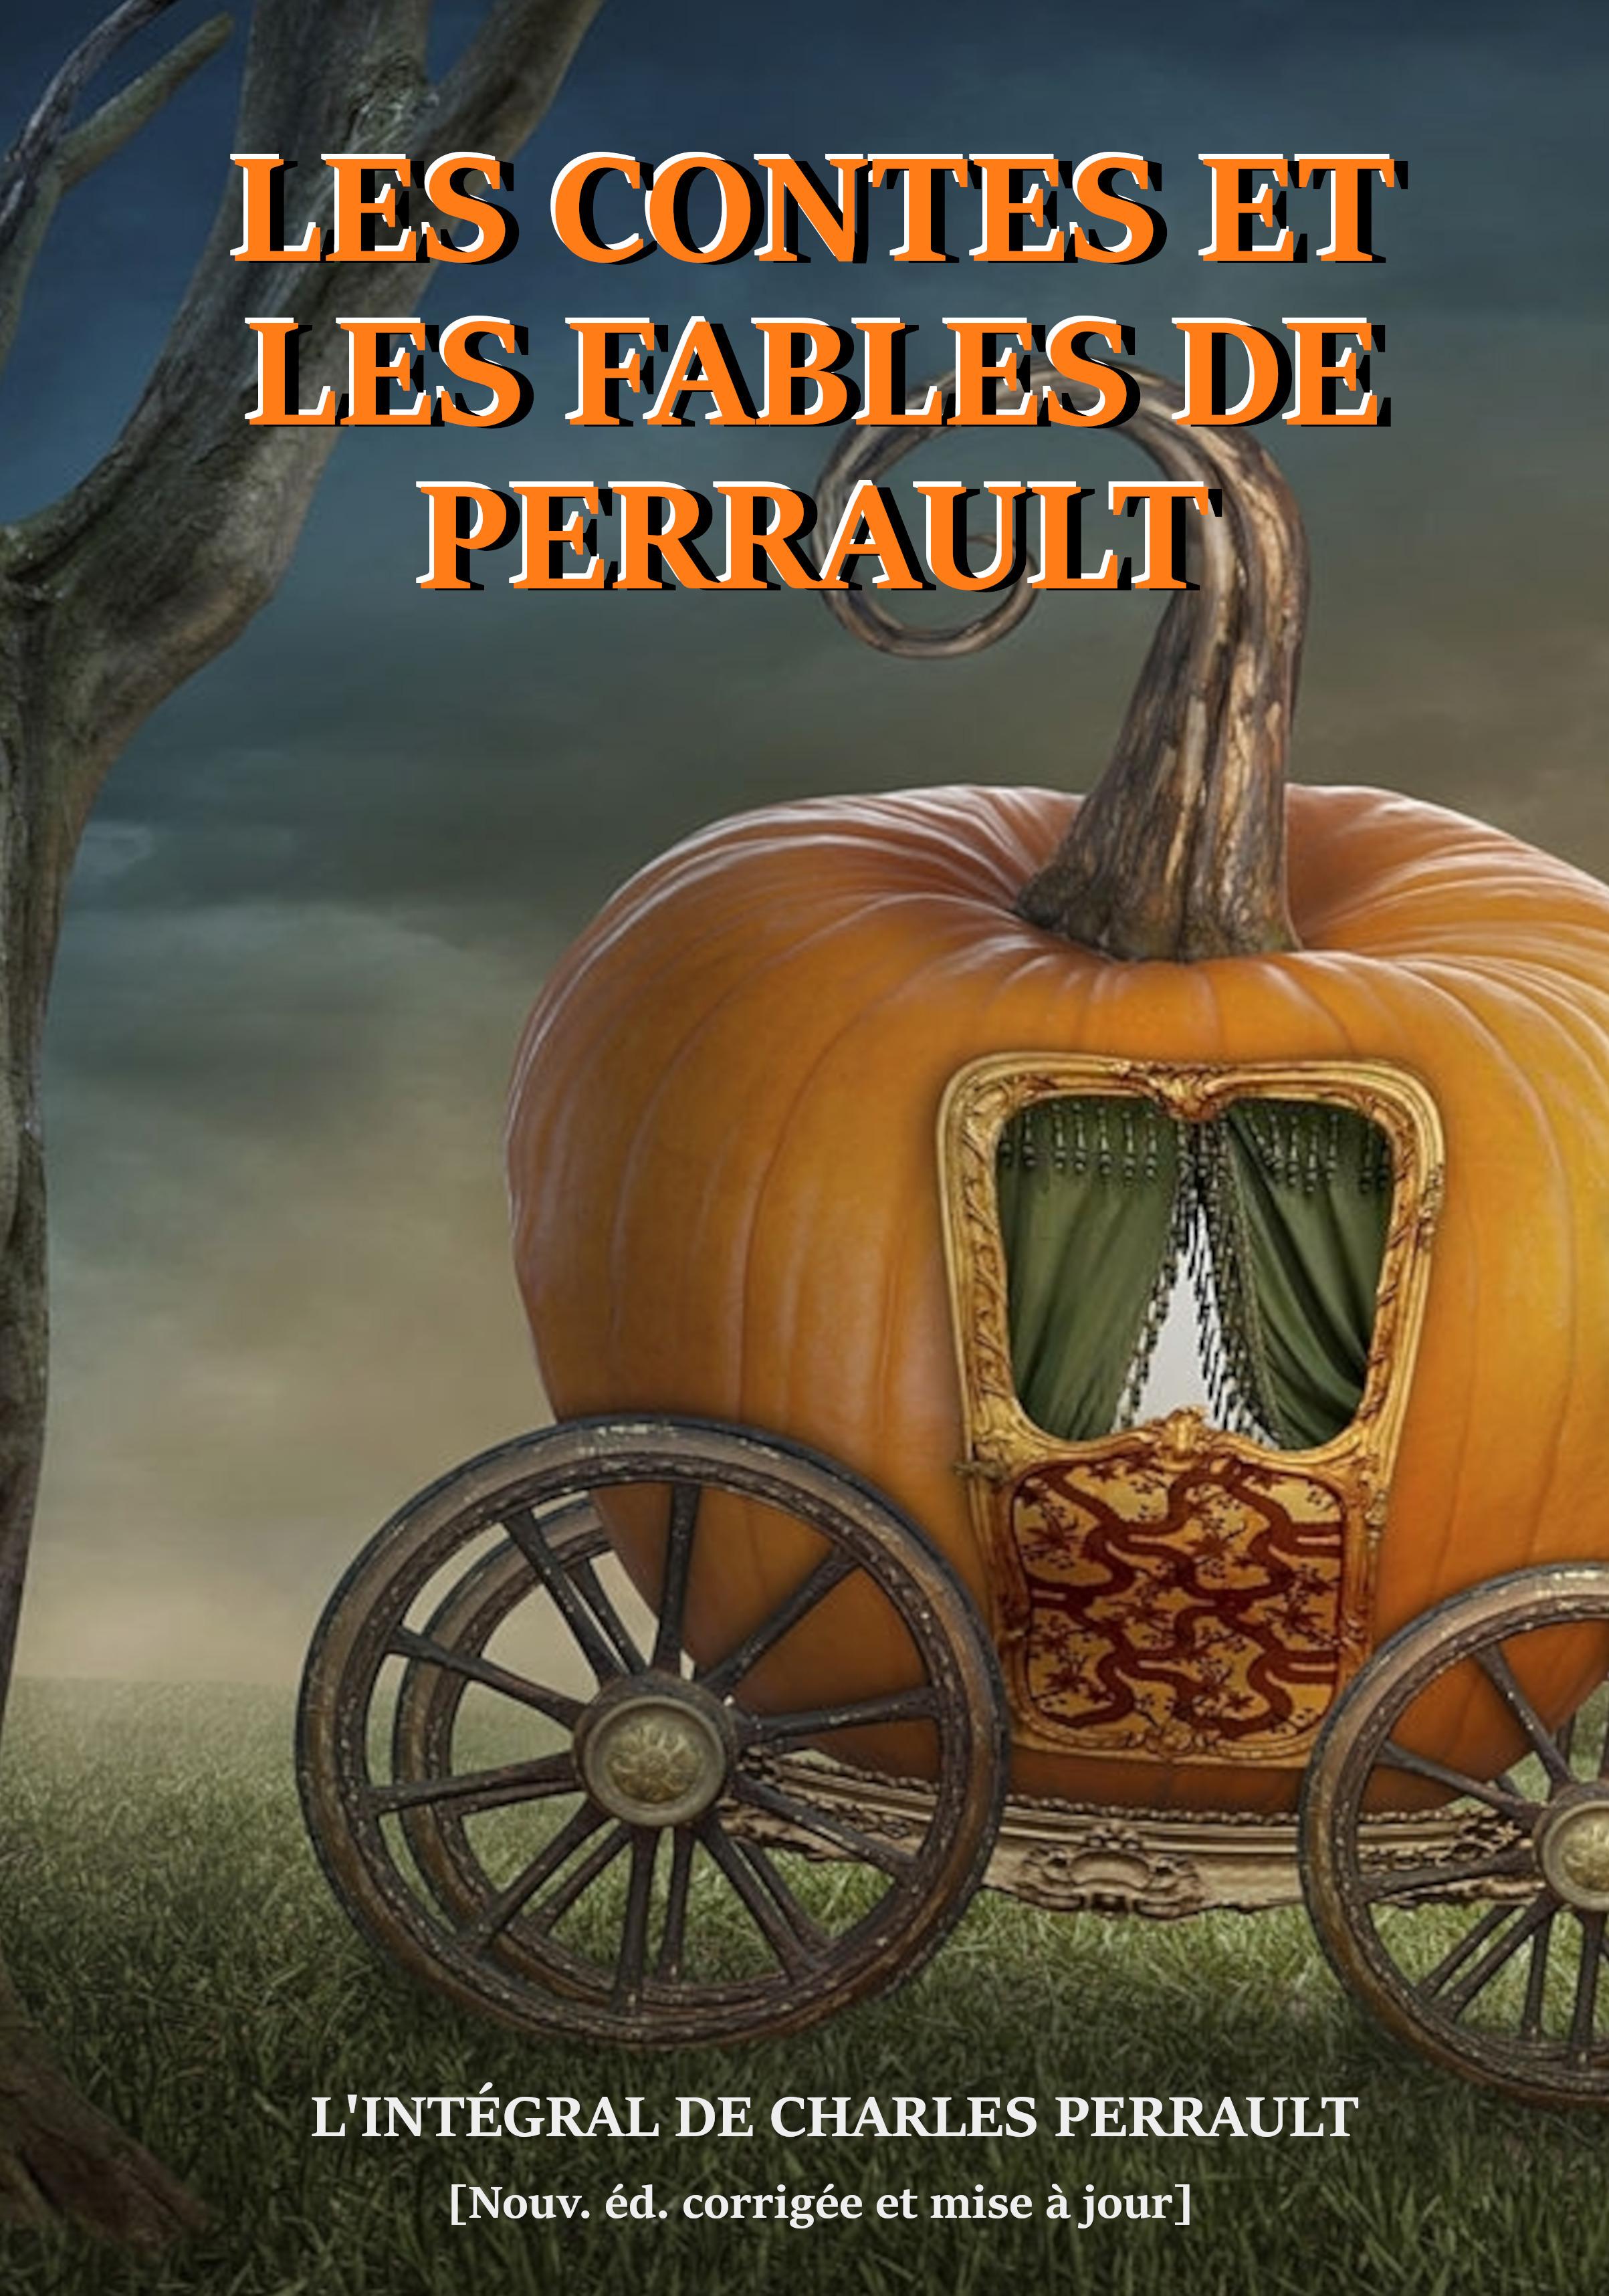 Les contes et les fables de Perrault